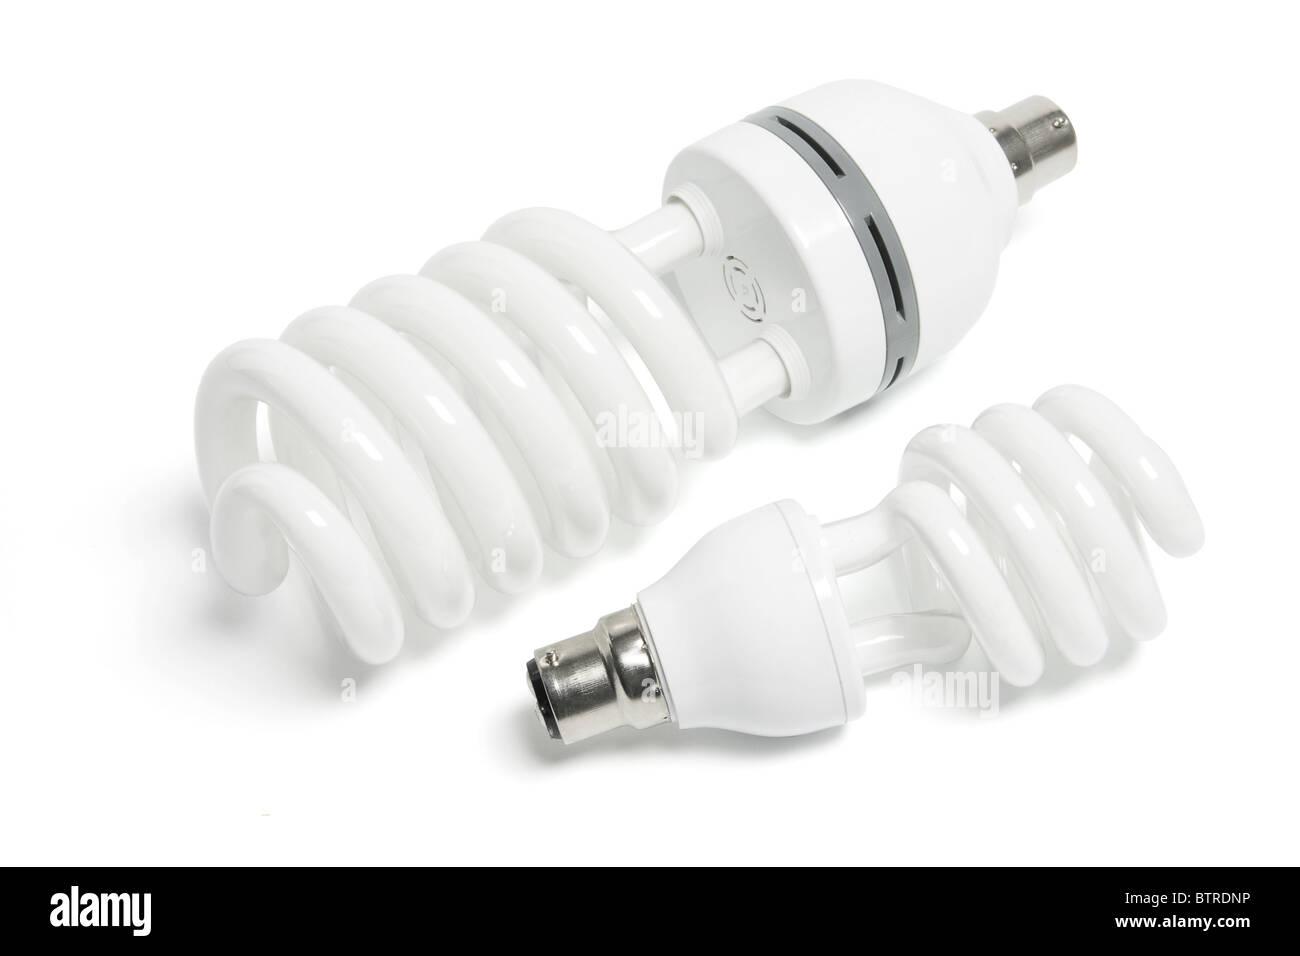 Compact Fluorescent Lightbulbs - Stock Image